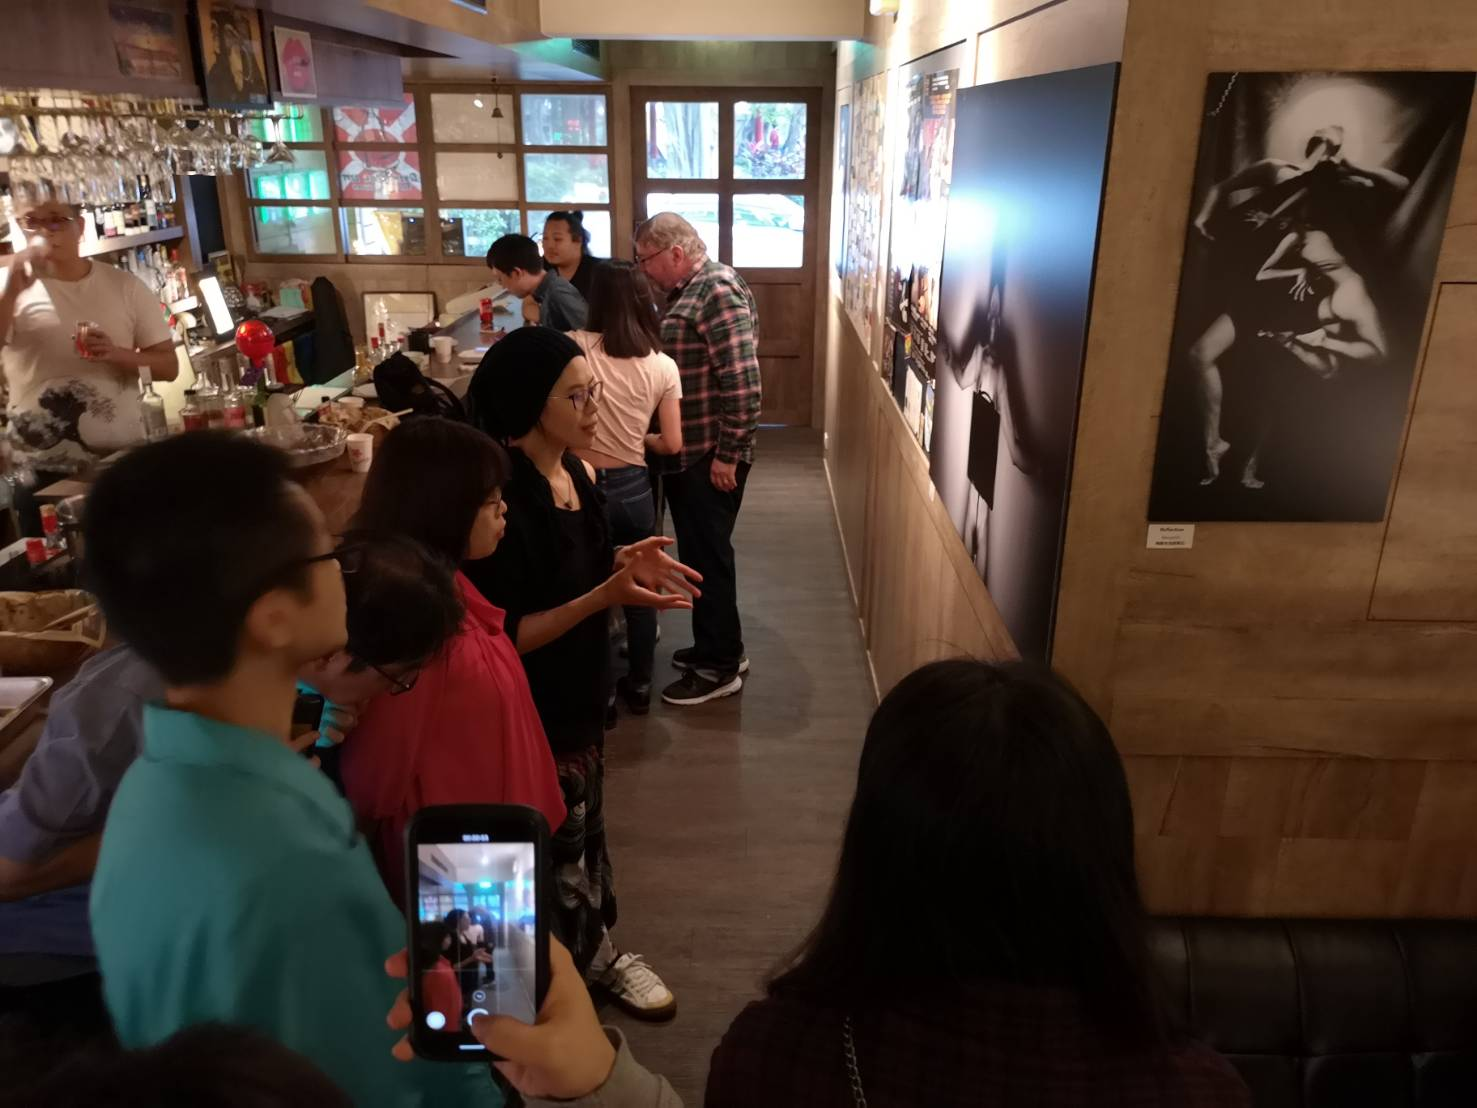 Reflection - Suelynee's Solo Exhibition opening